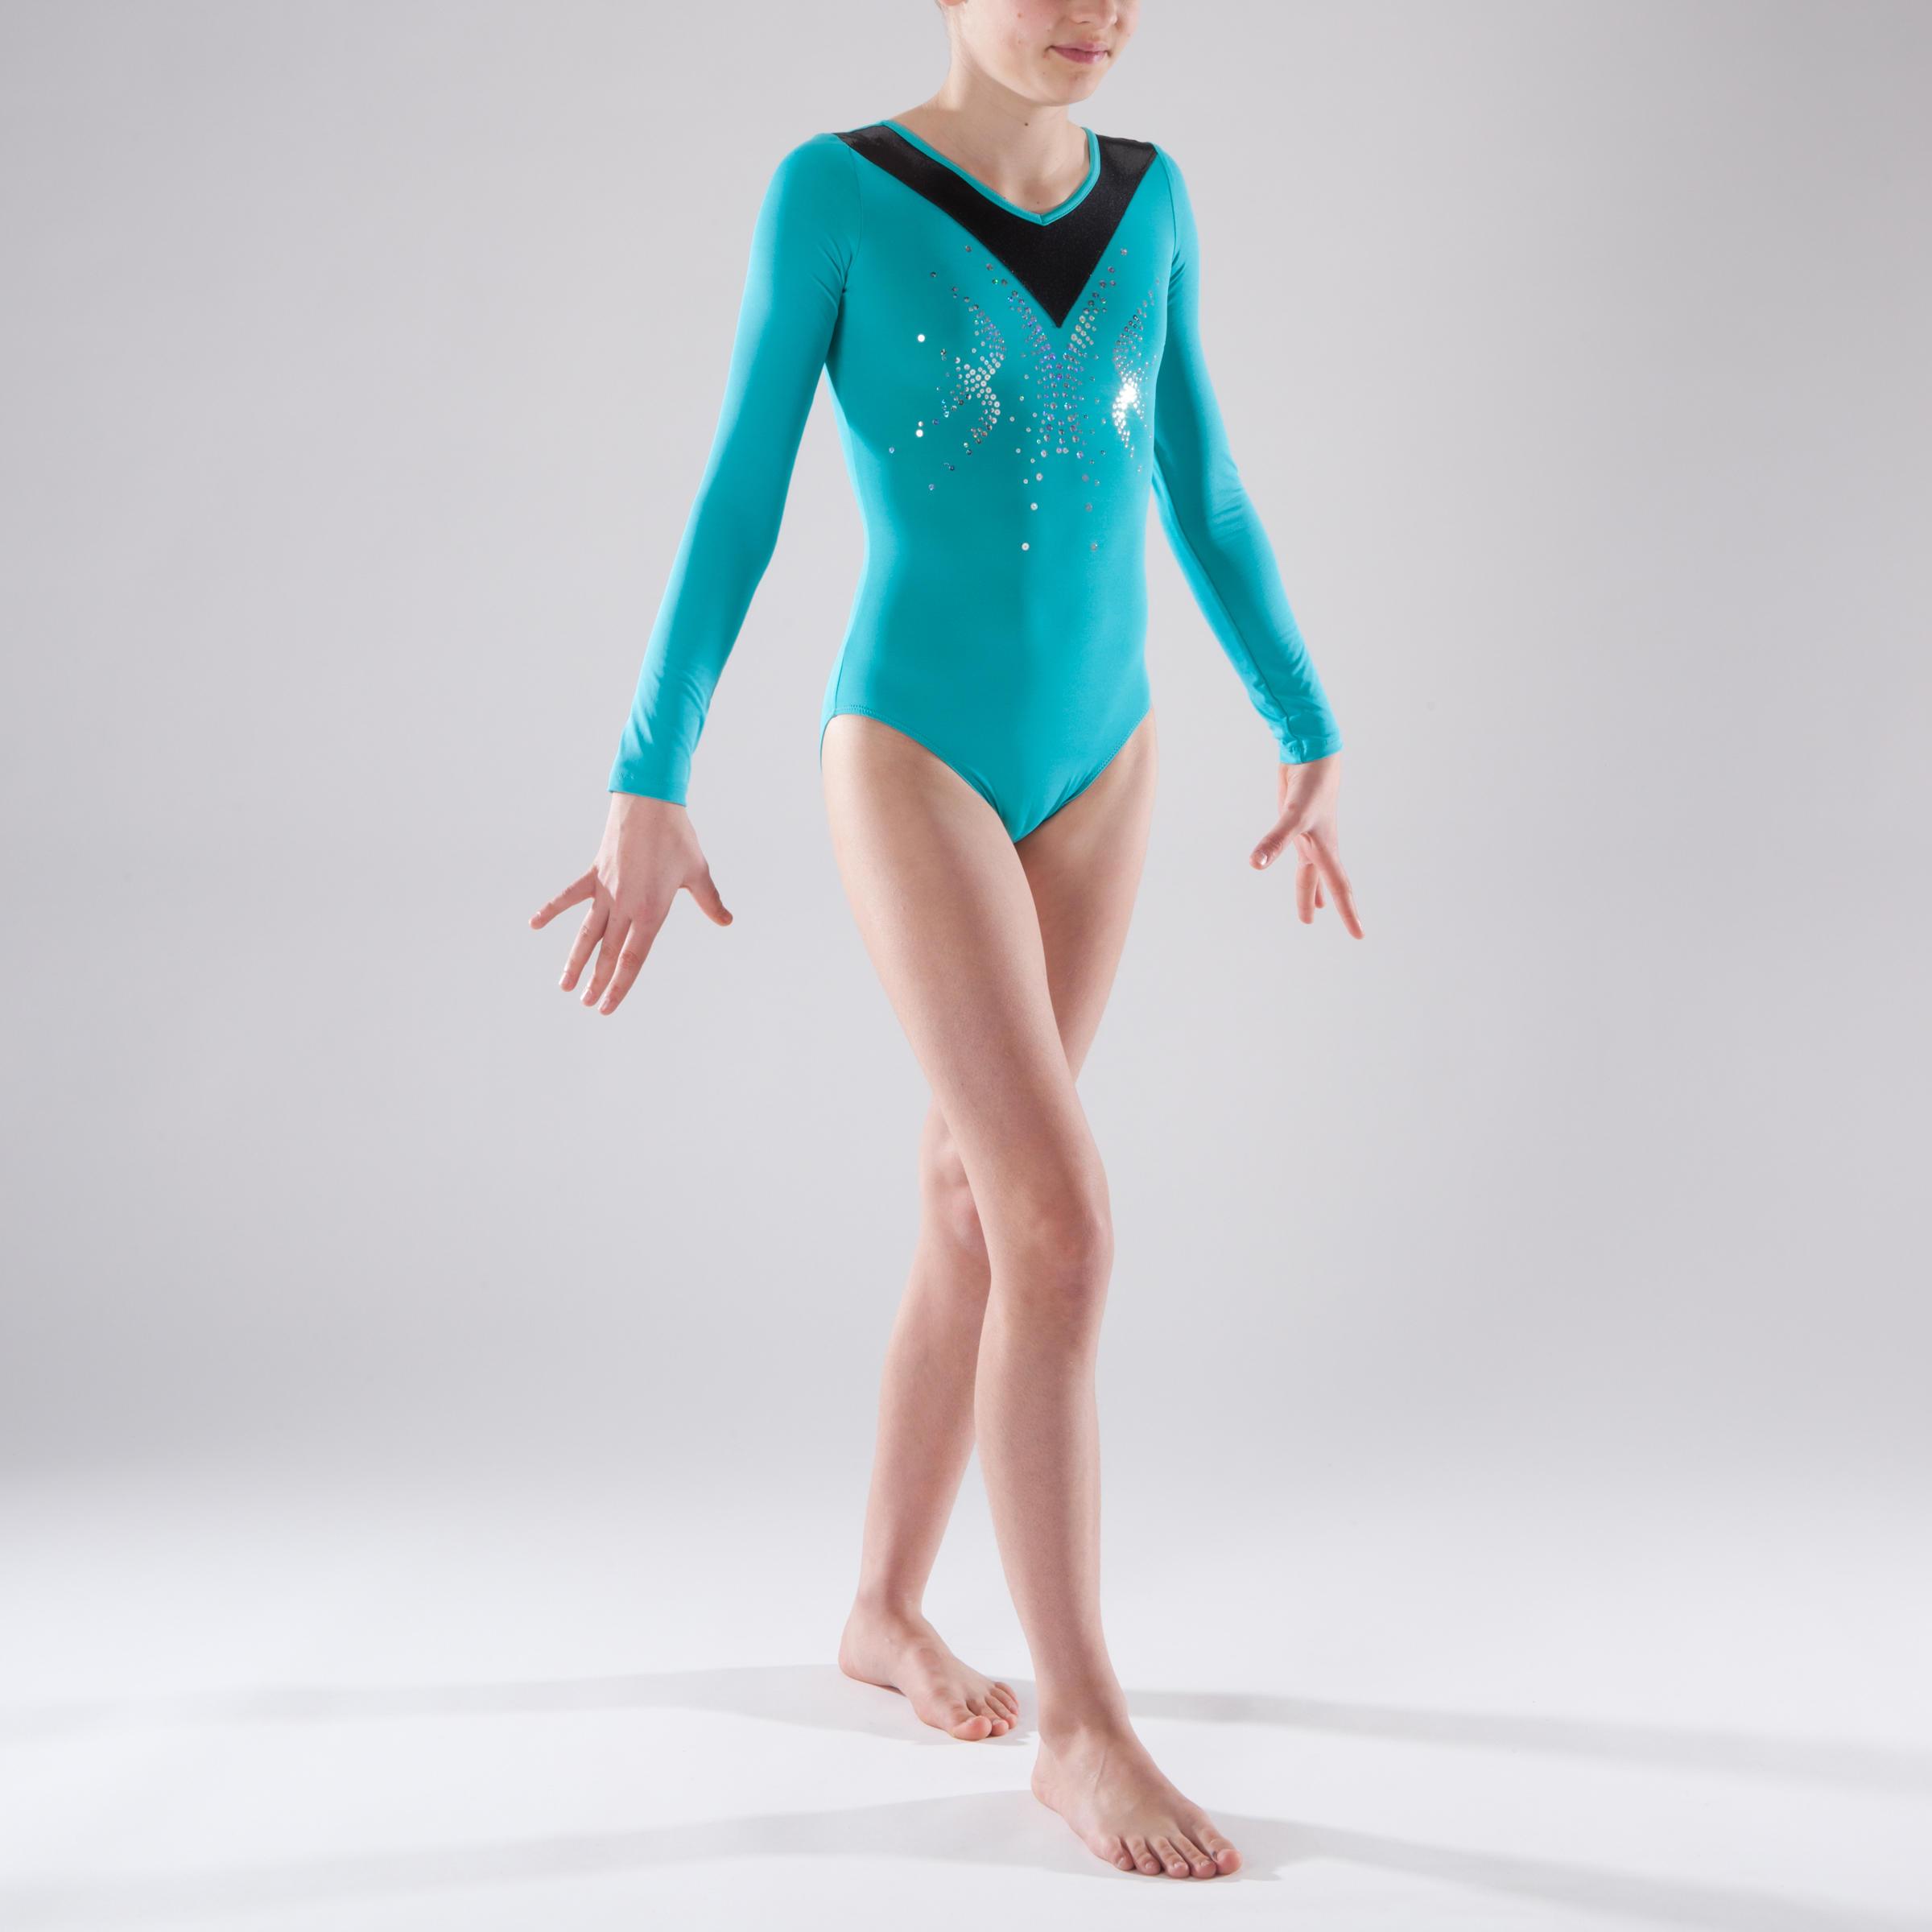 Leotardo de manga larga gimnasia femenina turquesa lentejuelas